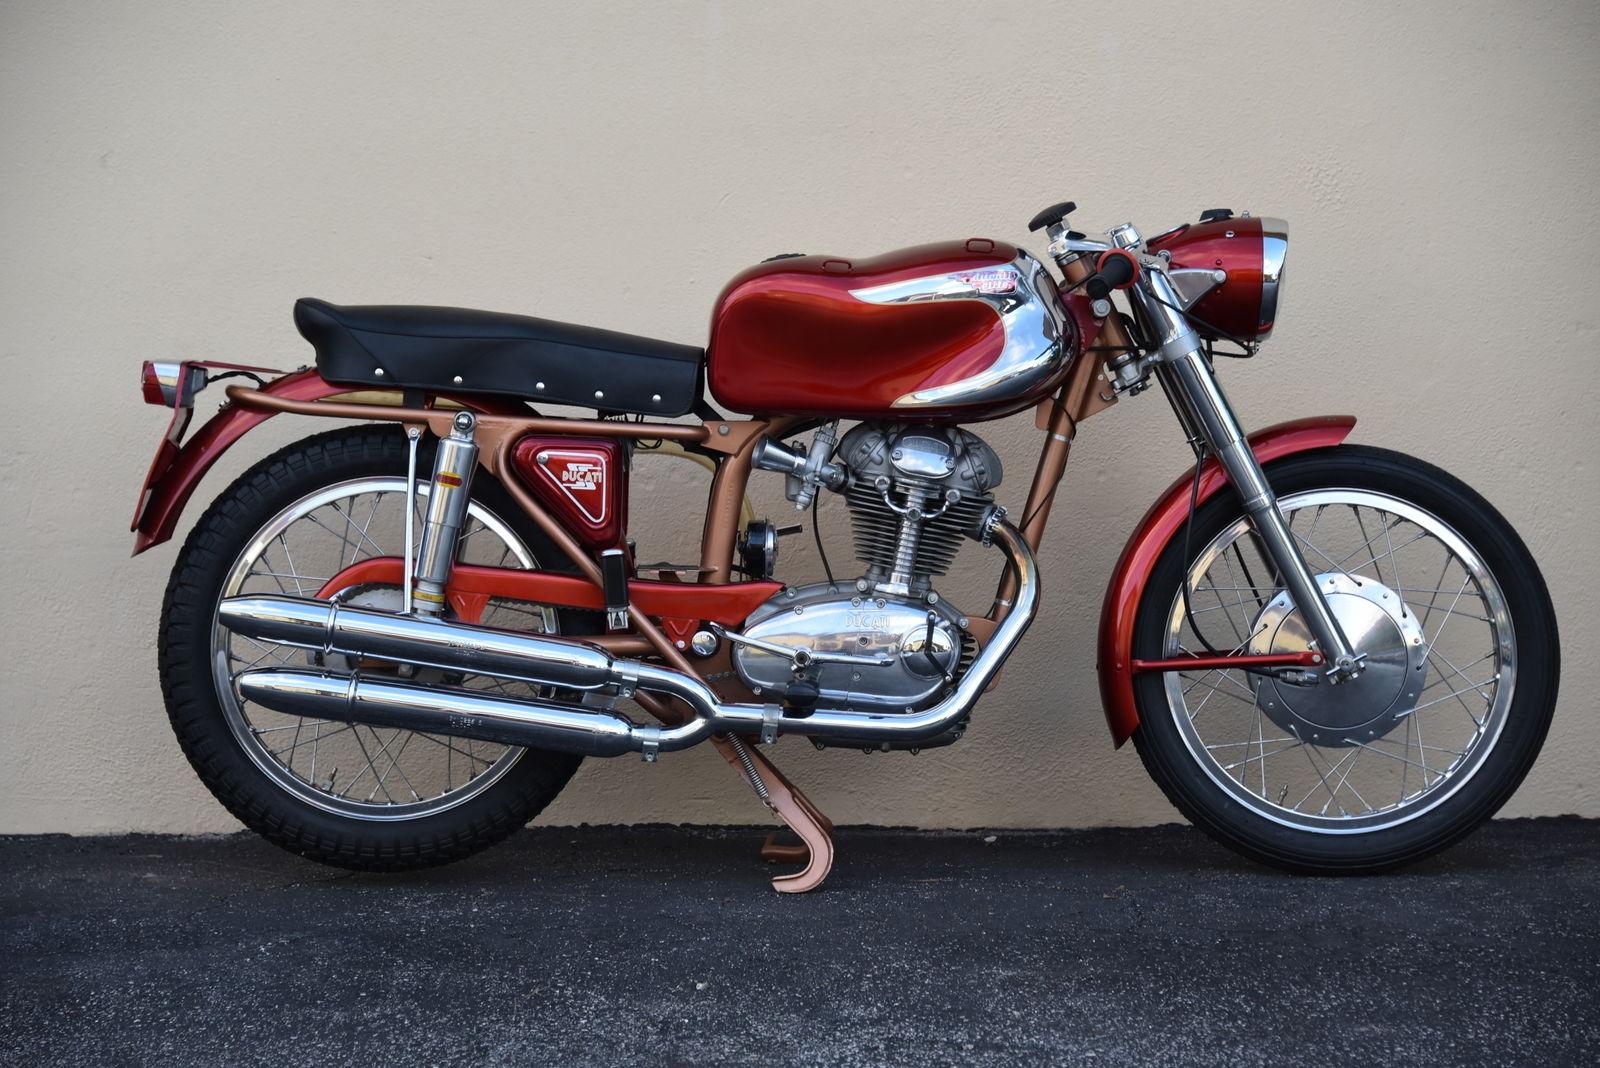 Ducati  For Sale In Florida